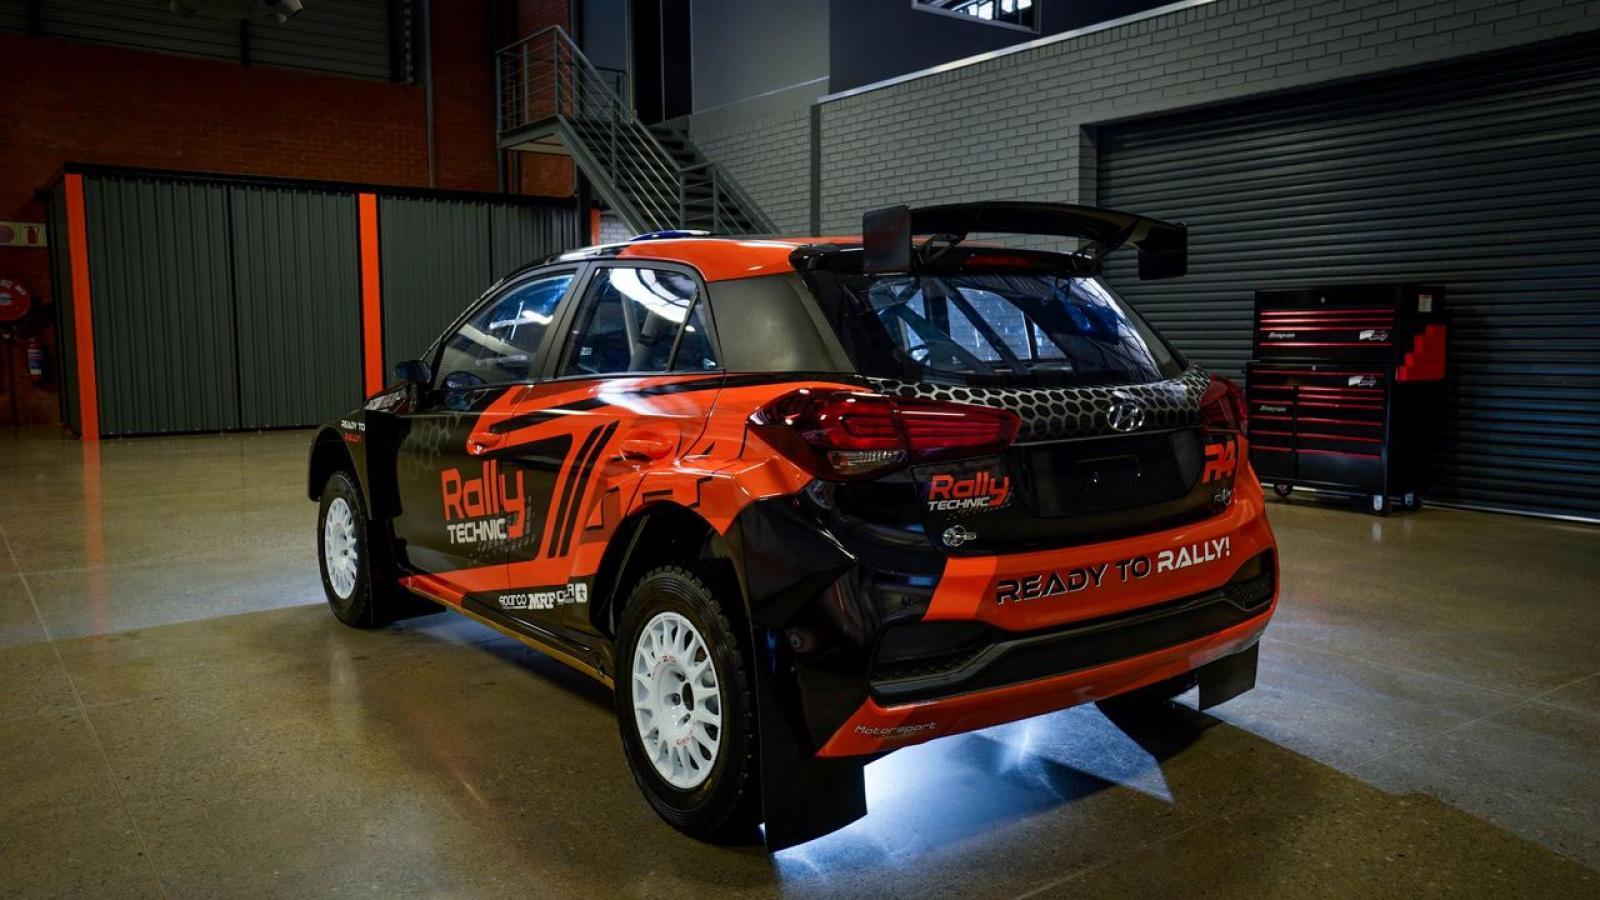 Hyundai I20 R4 (Rally2 Kit) - 2